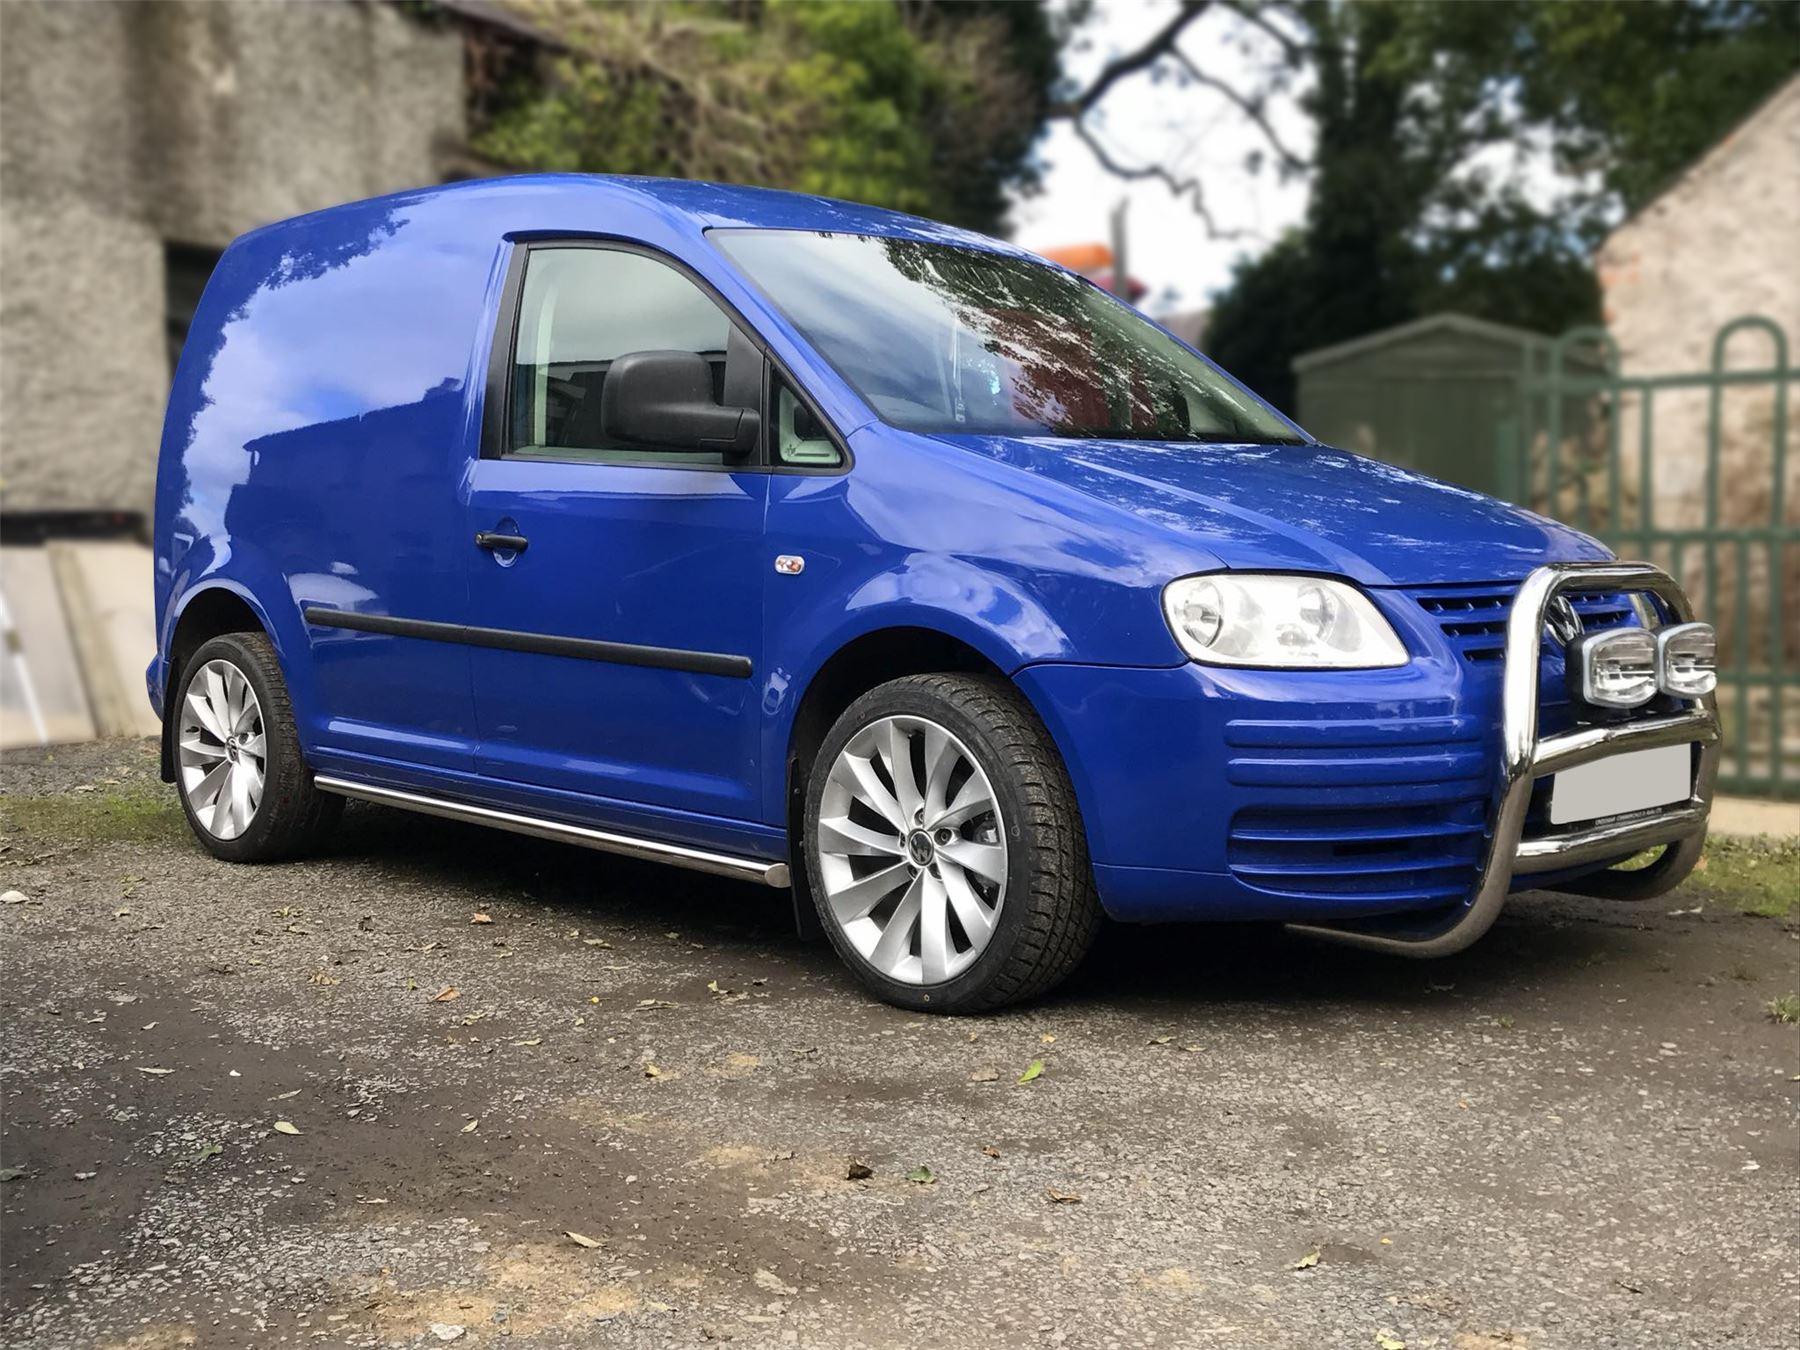 VW Volkswagen Caddy latérales polies en aluminium MARCHEPIEDS BARRES Pour s/'Adapter 2015